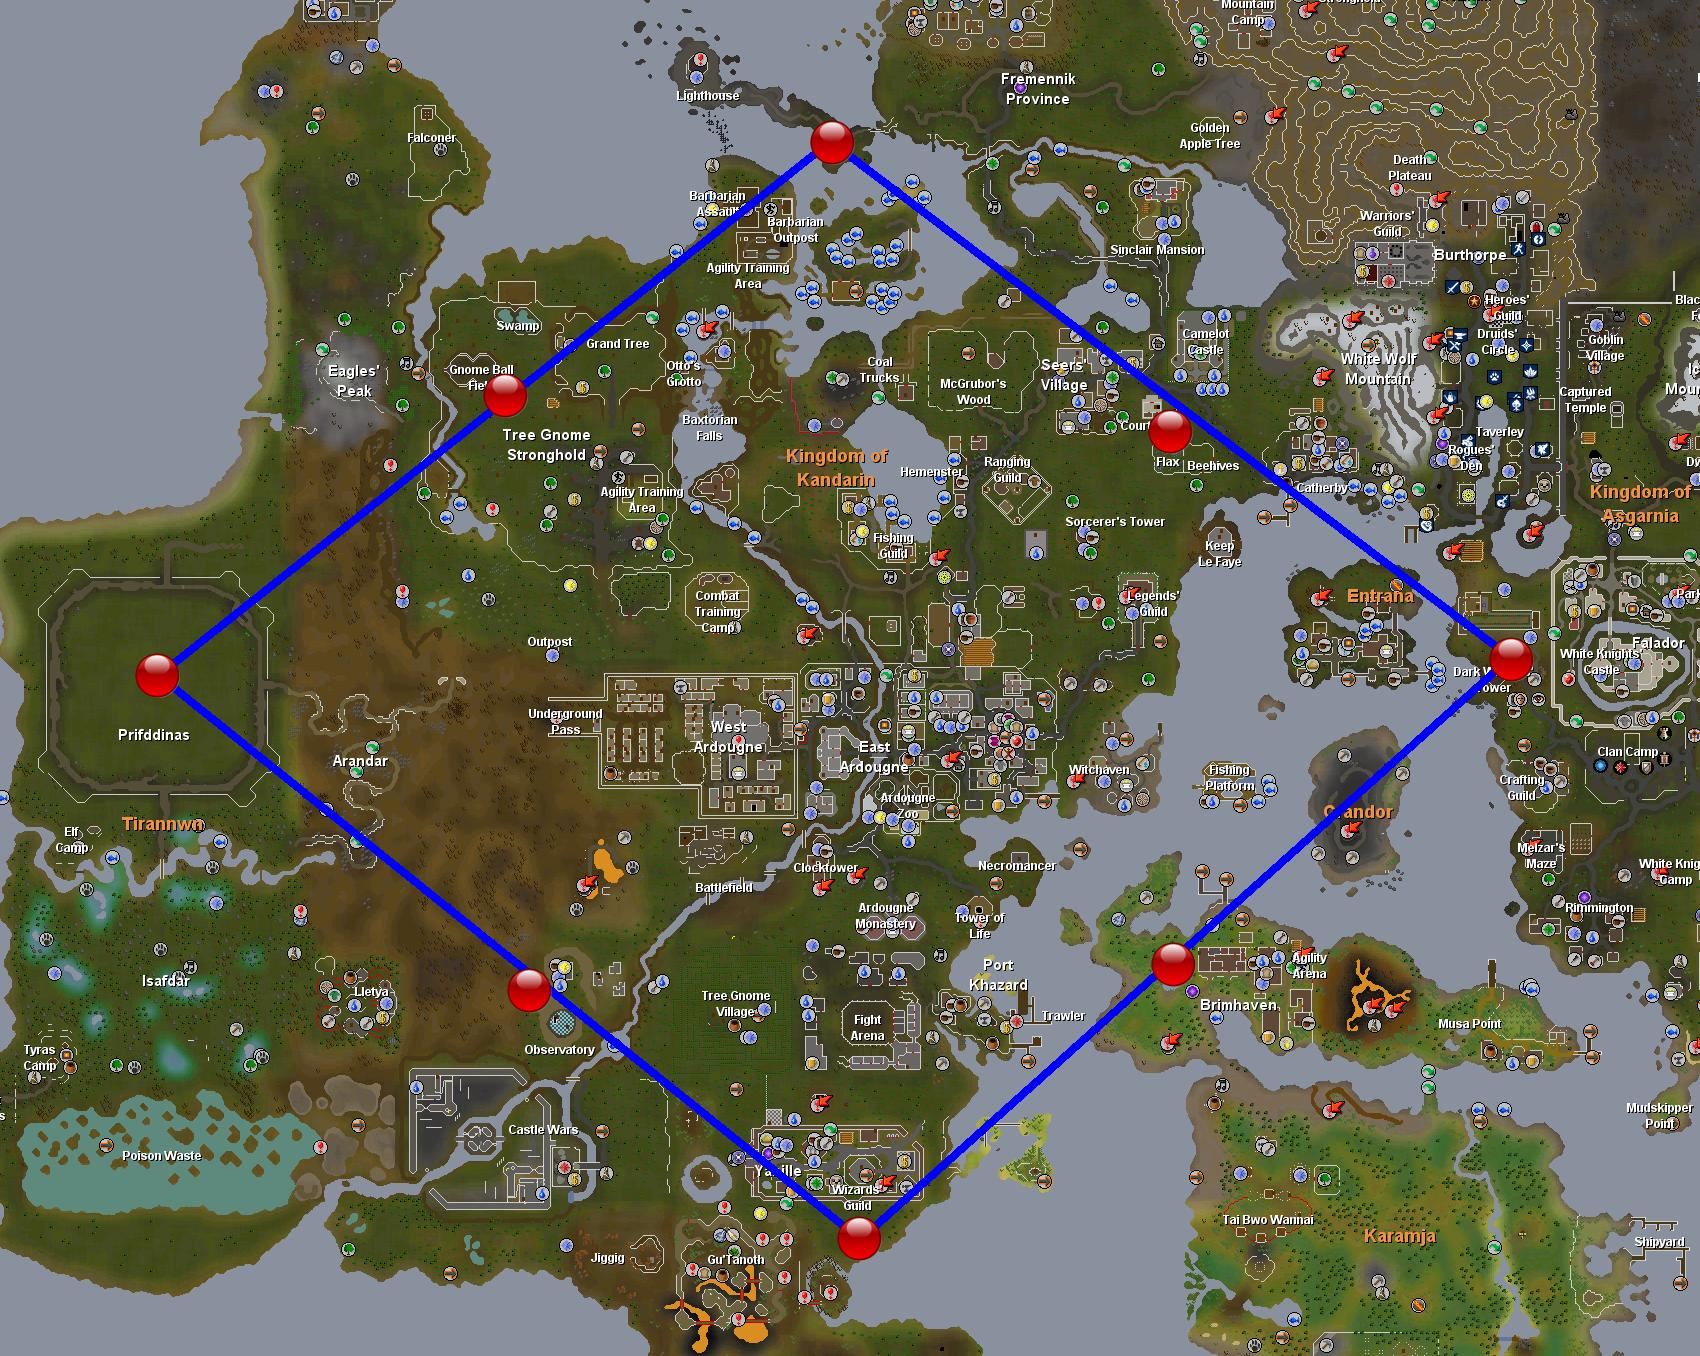 Crystal_tree_map_diamond.png